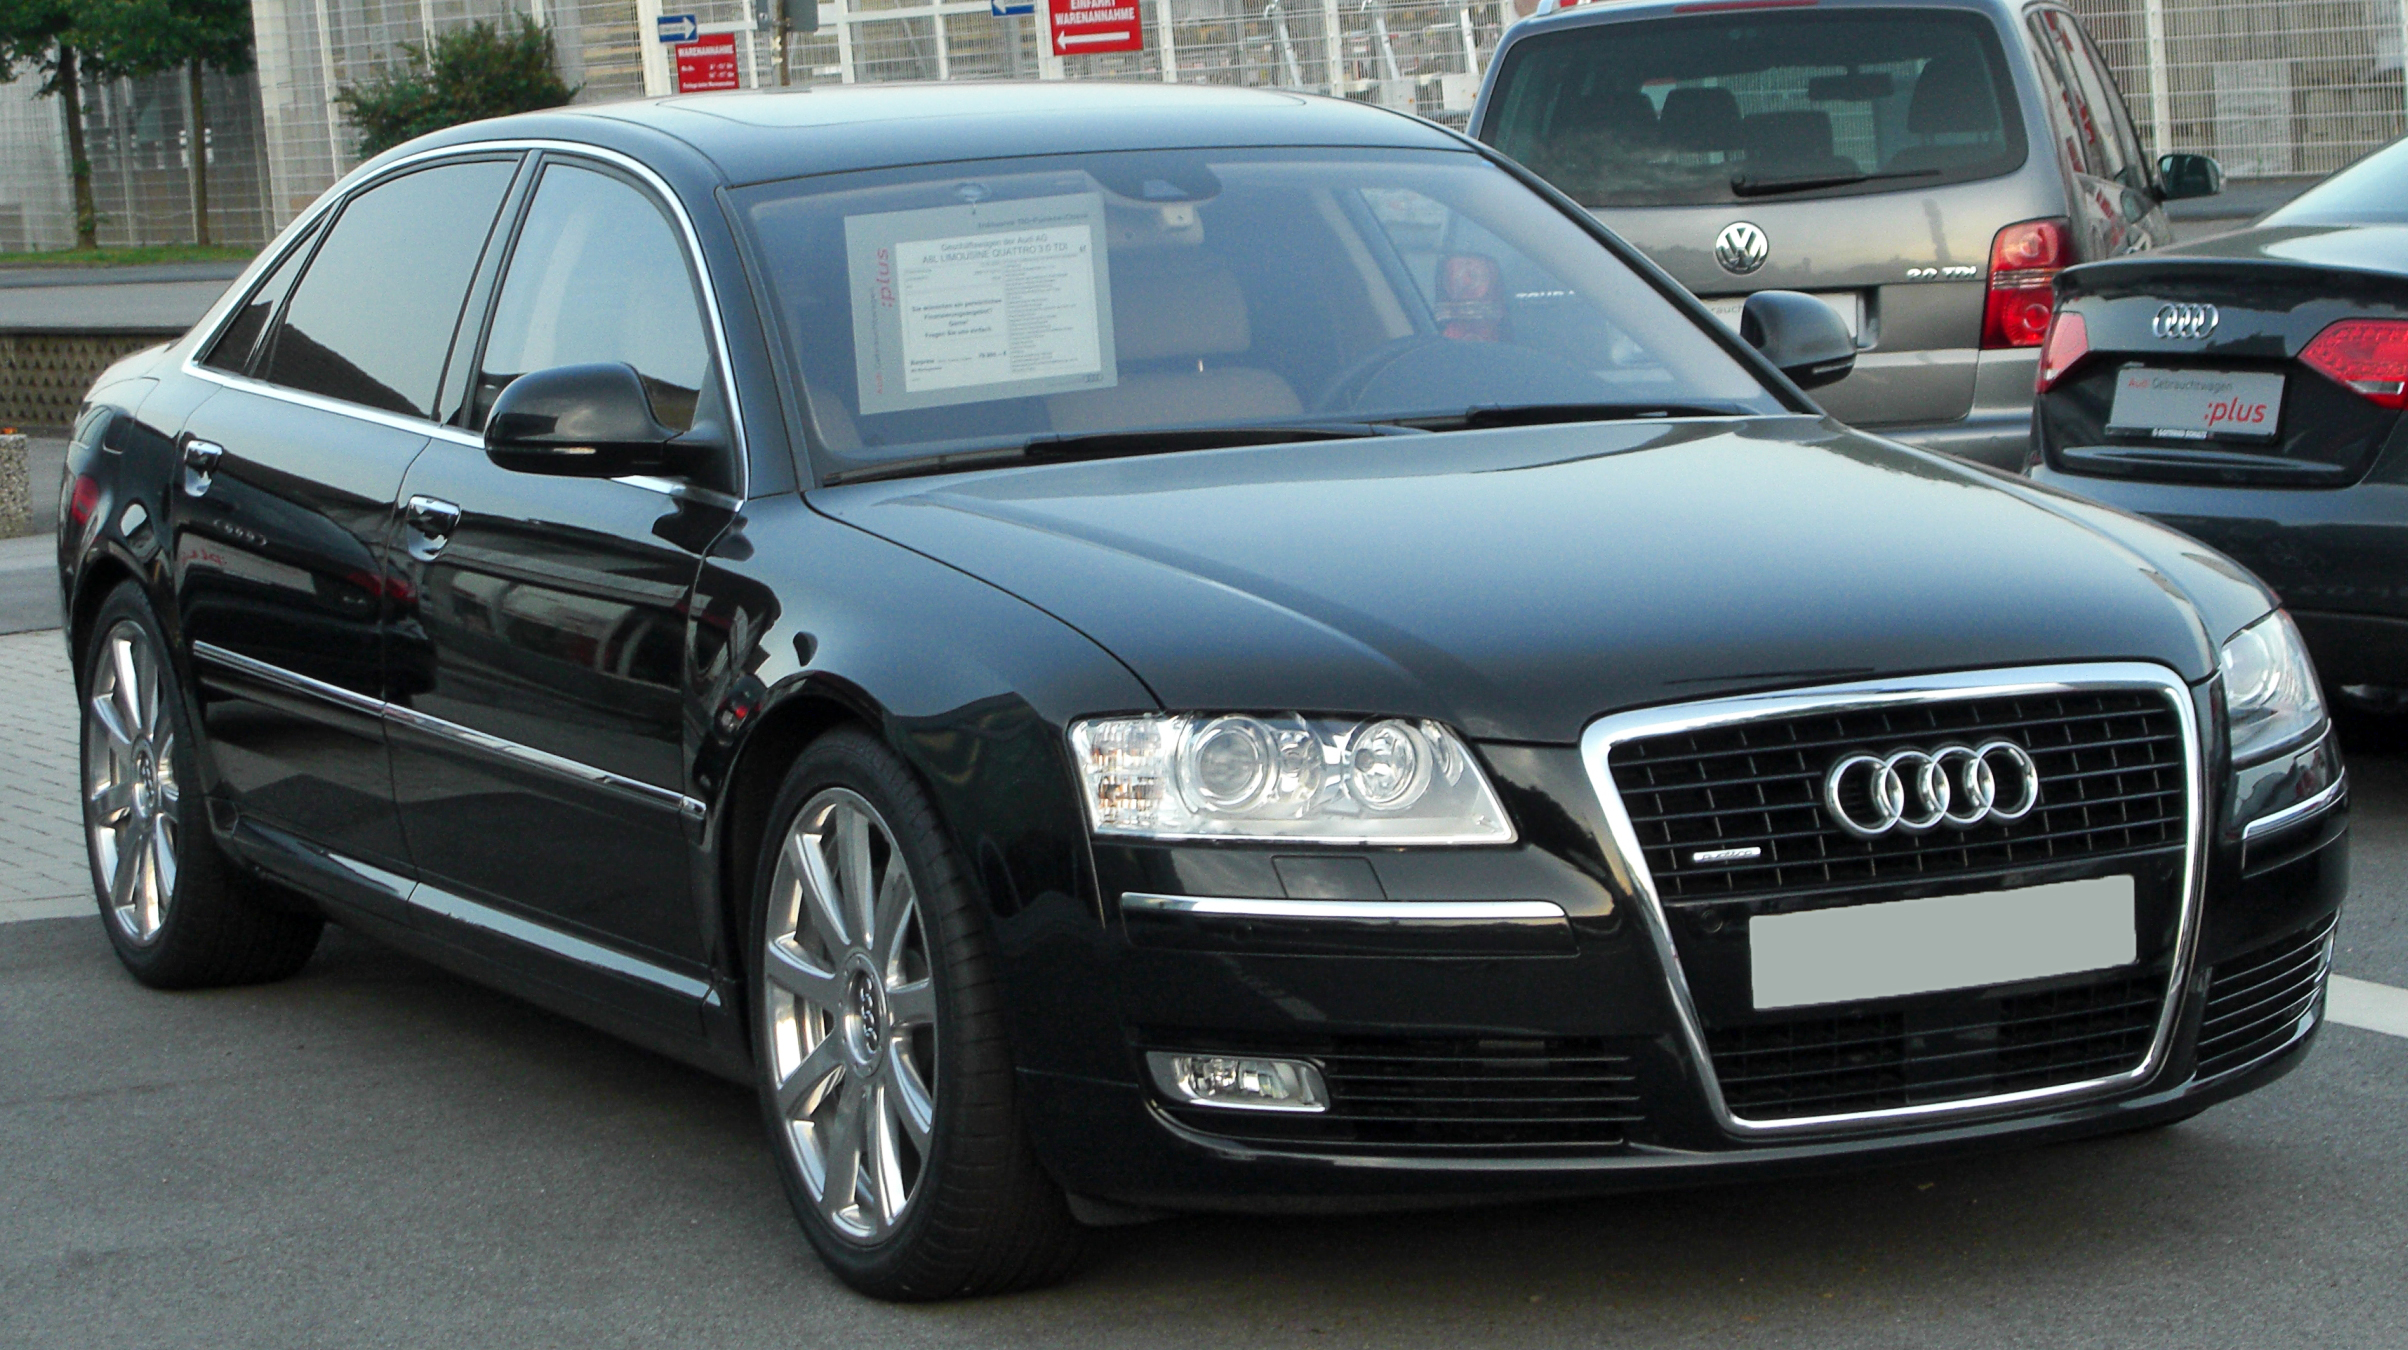 File:Audi A8 L 3.0 TDI quattro D3 II. Facelift front 20100710.jpg ...